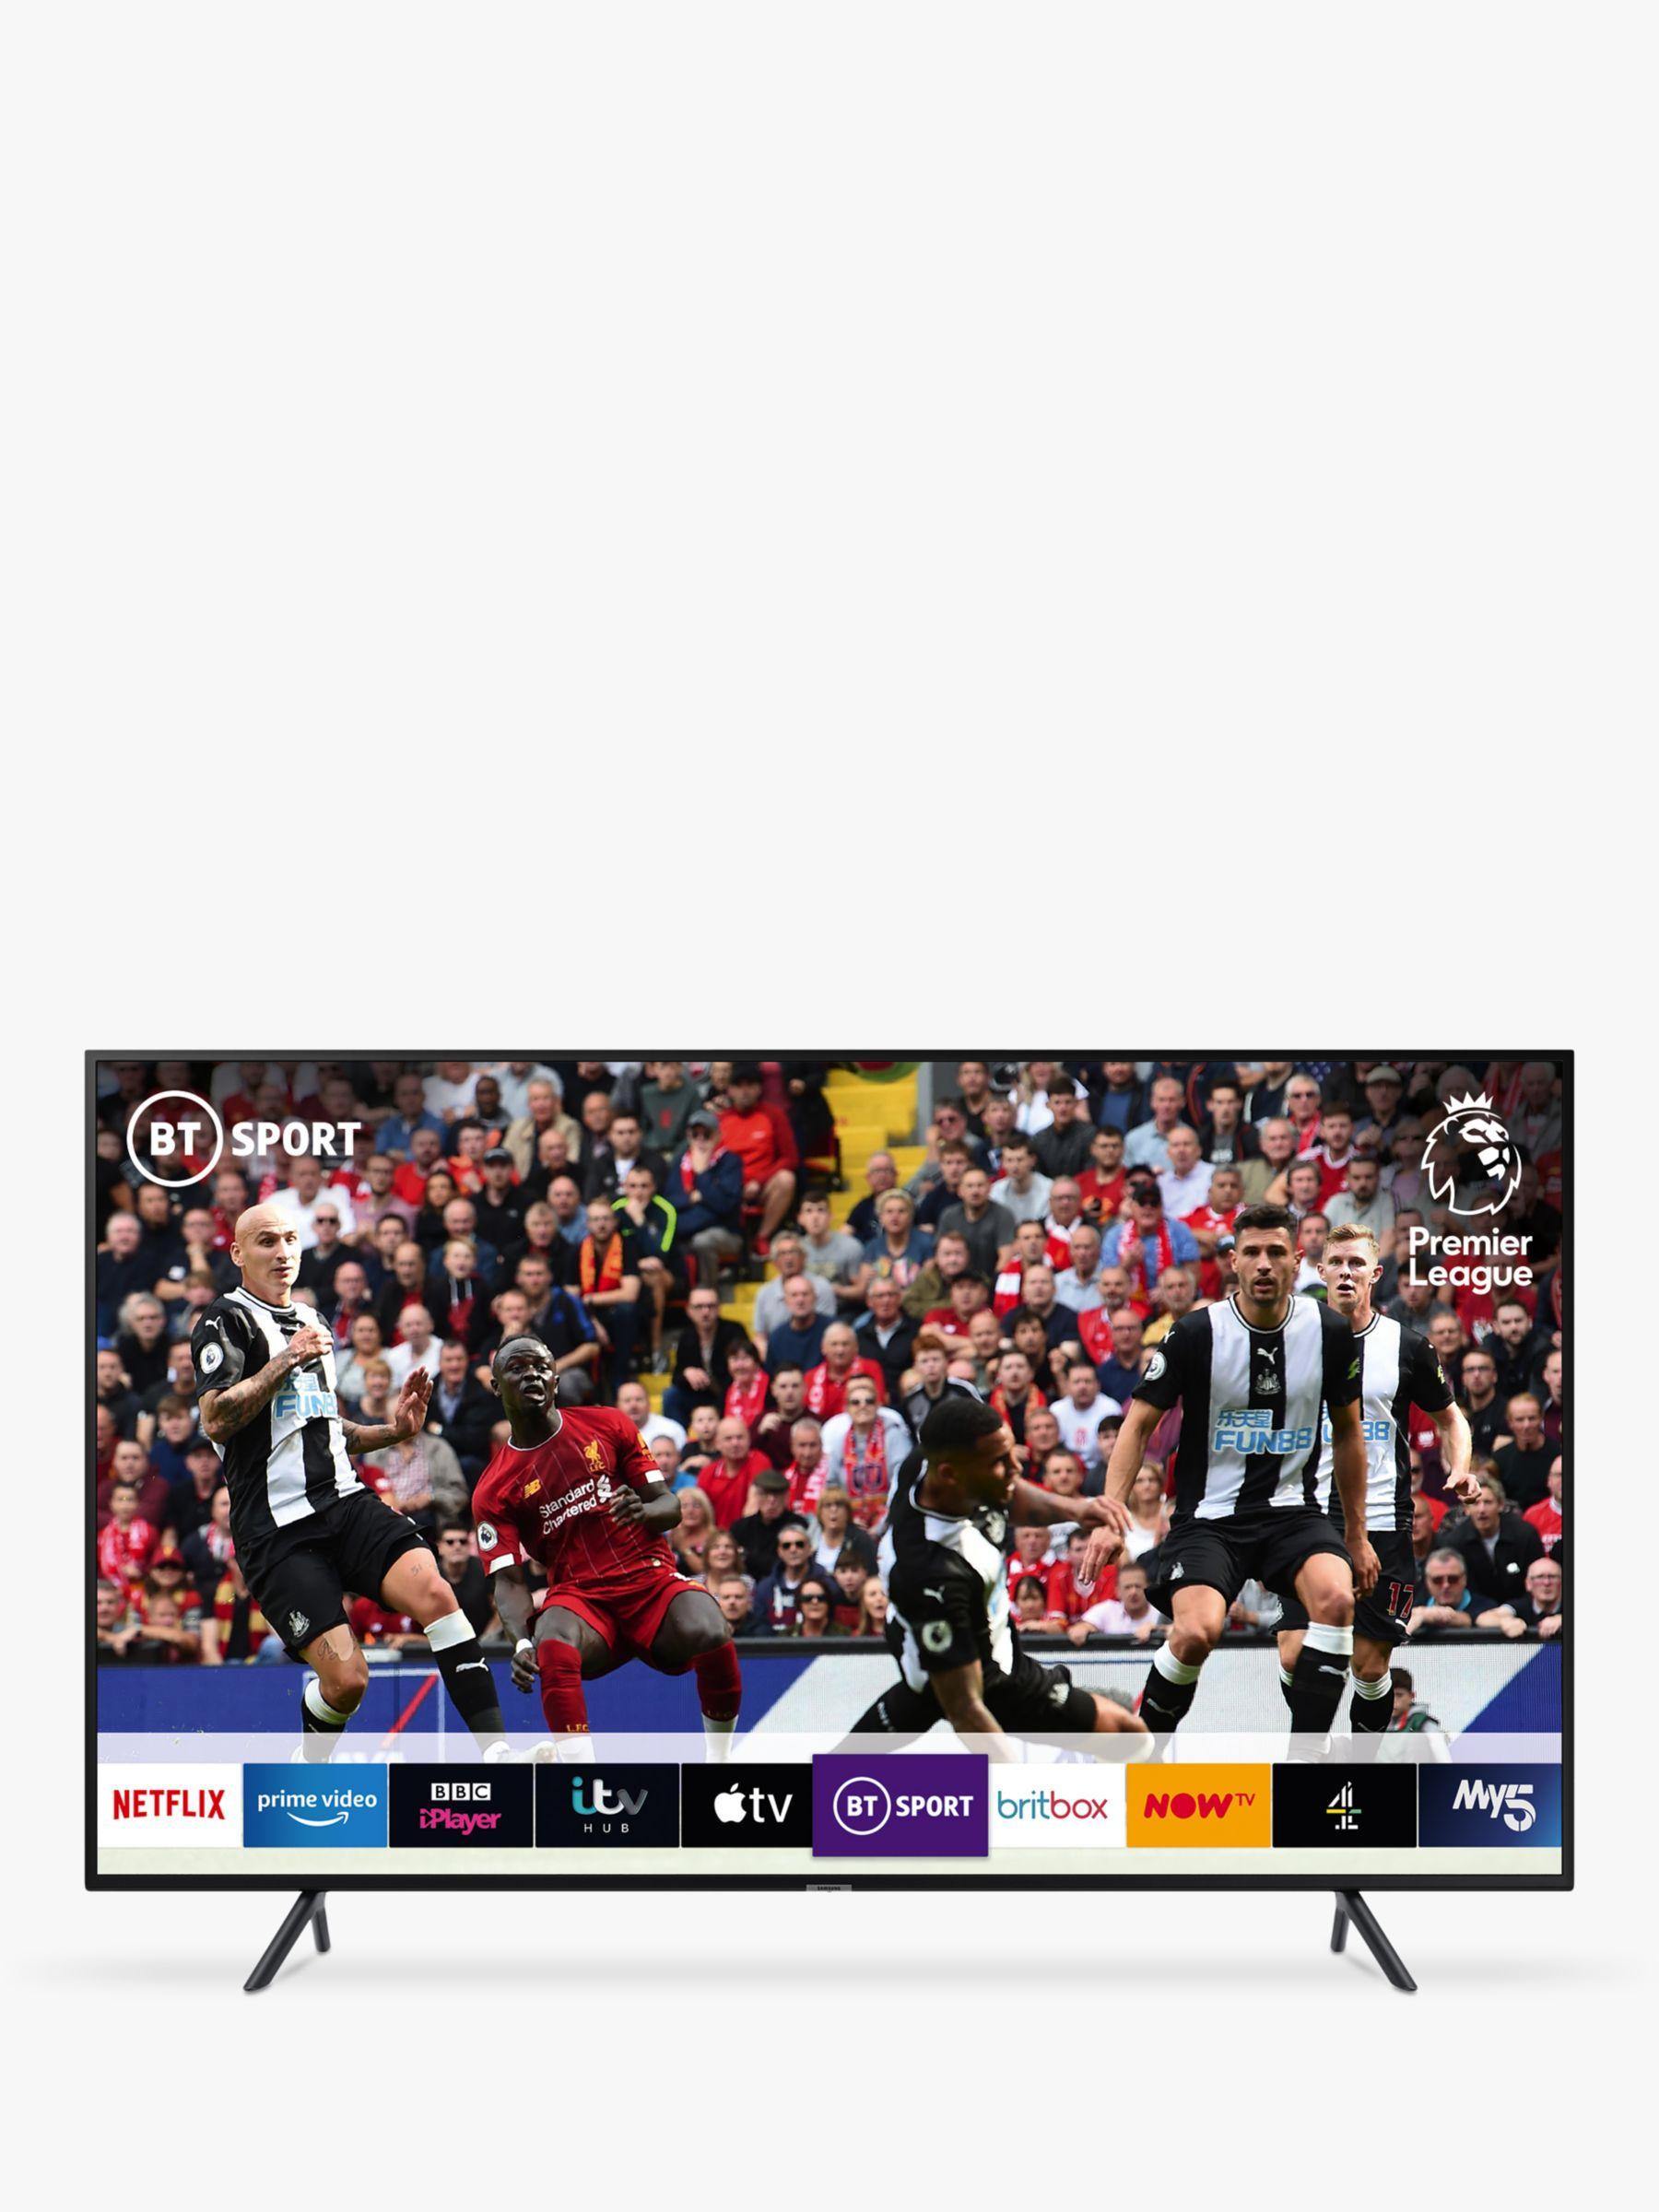 Samsung UE43RU7100 (2019) HDR 4K Ultra HD Smart TV, 43